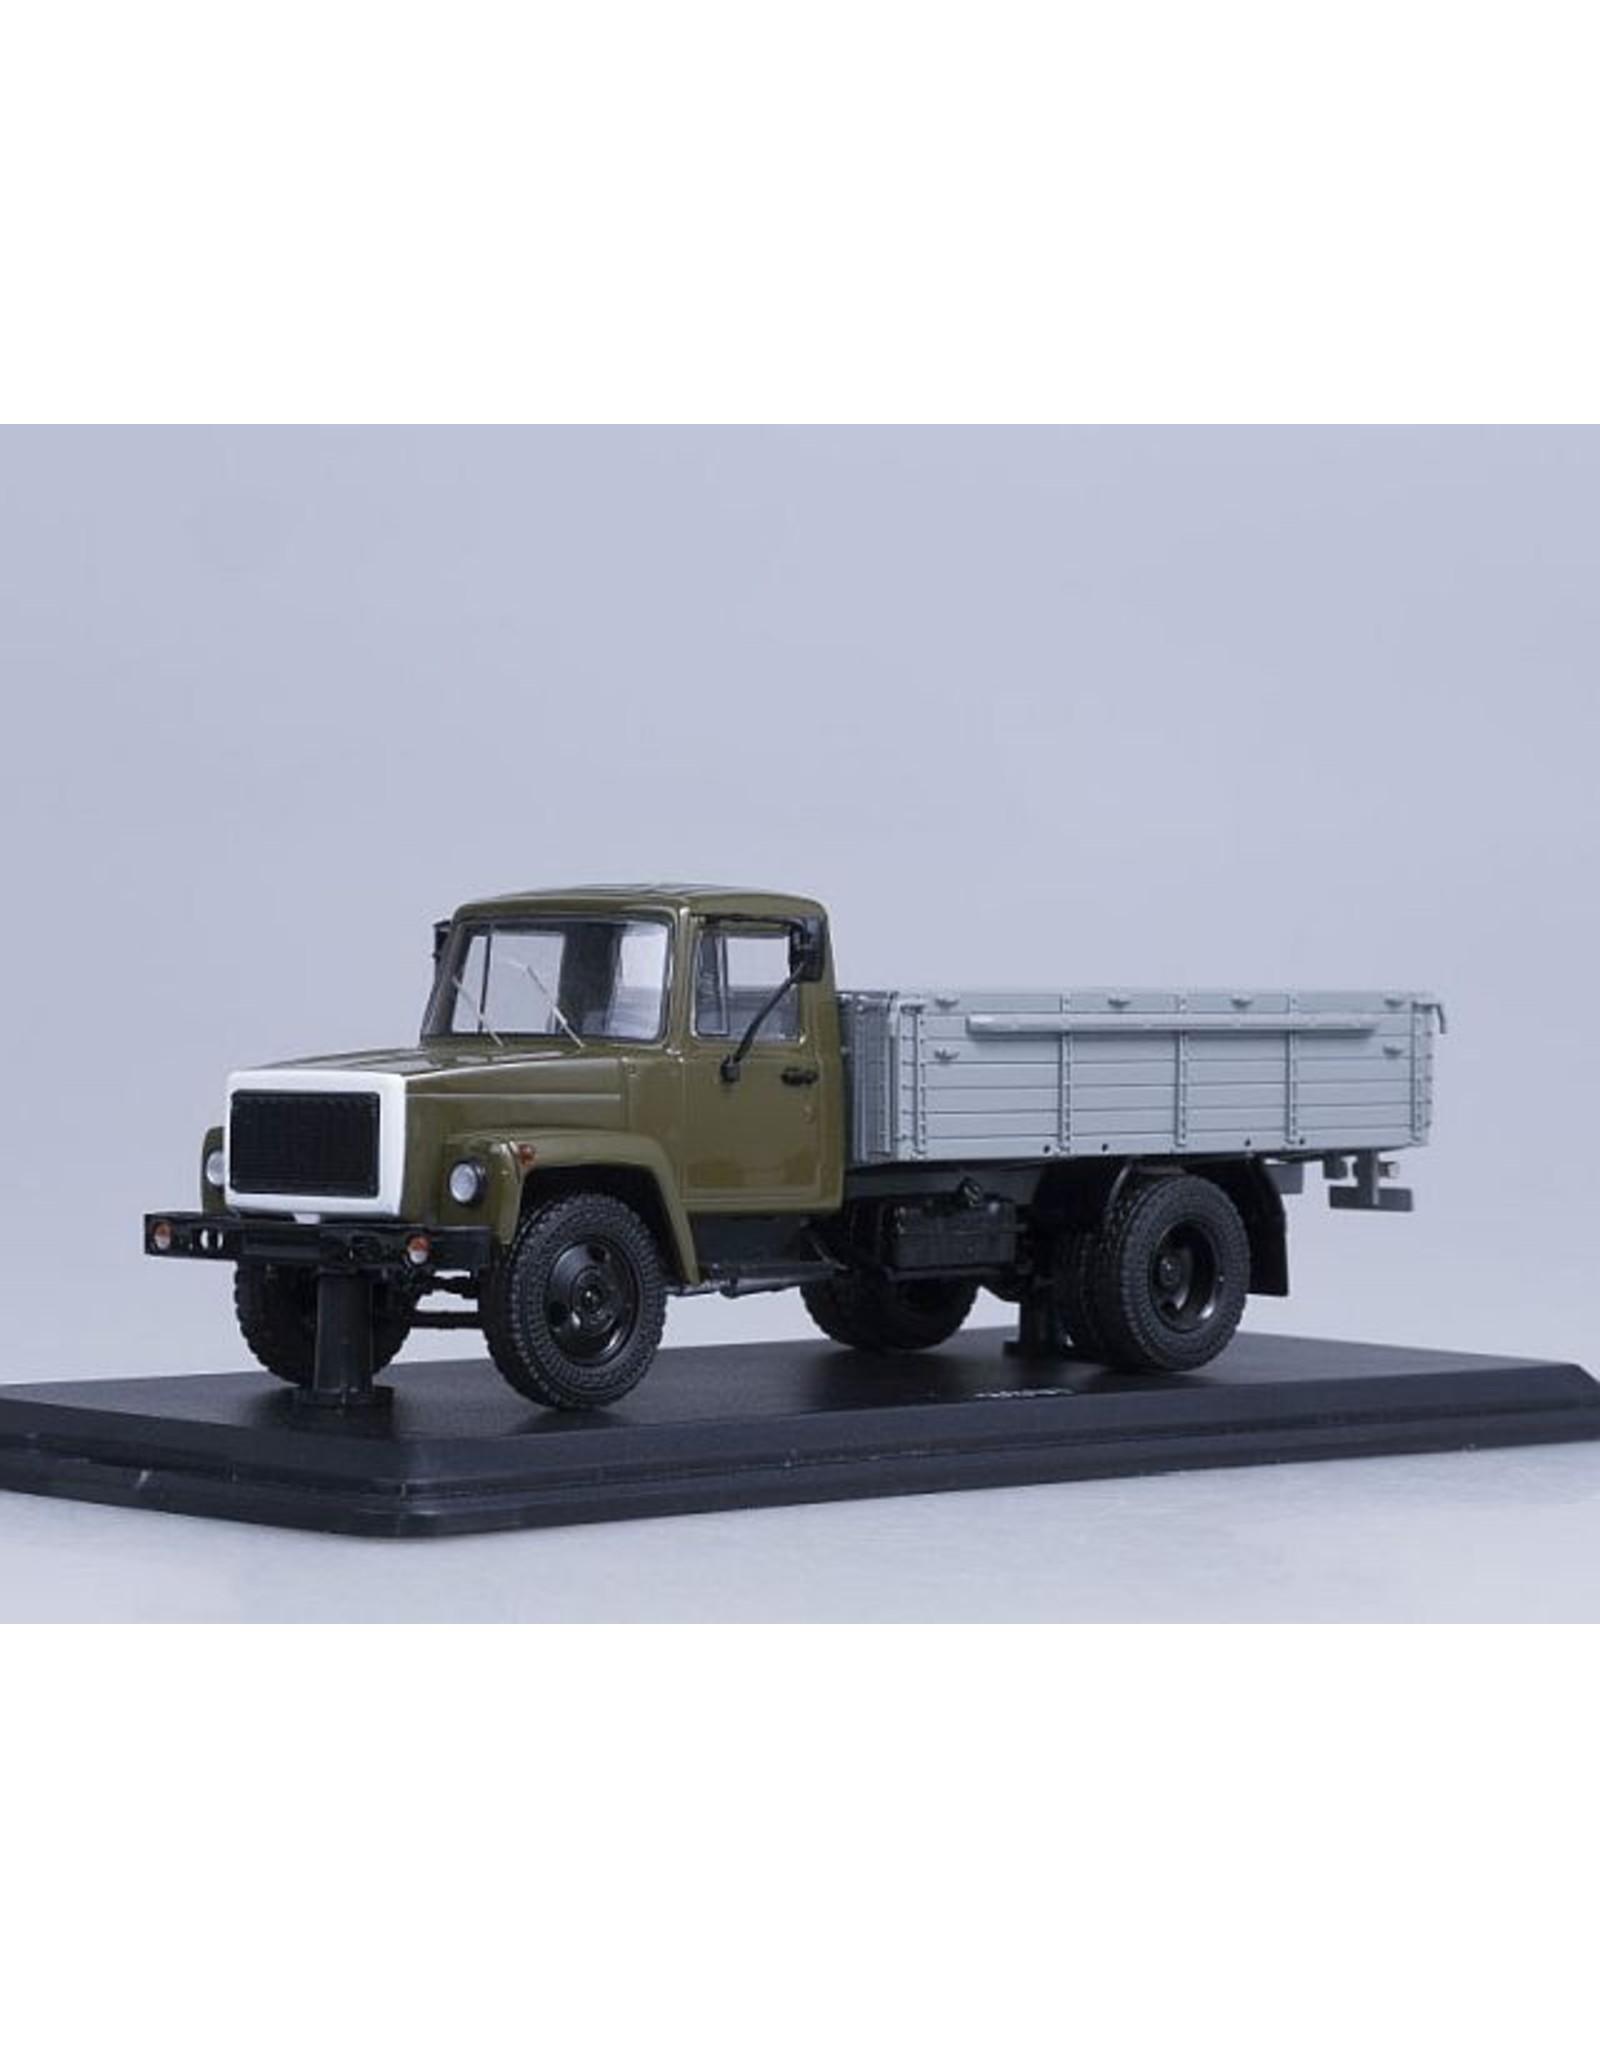 GAZ GAZ-3307 FLATBED TRUCK(khaki/grey)